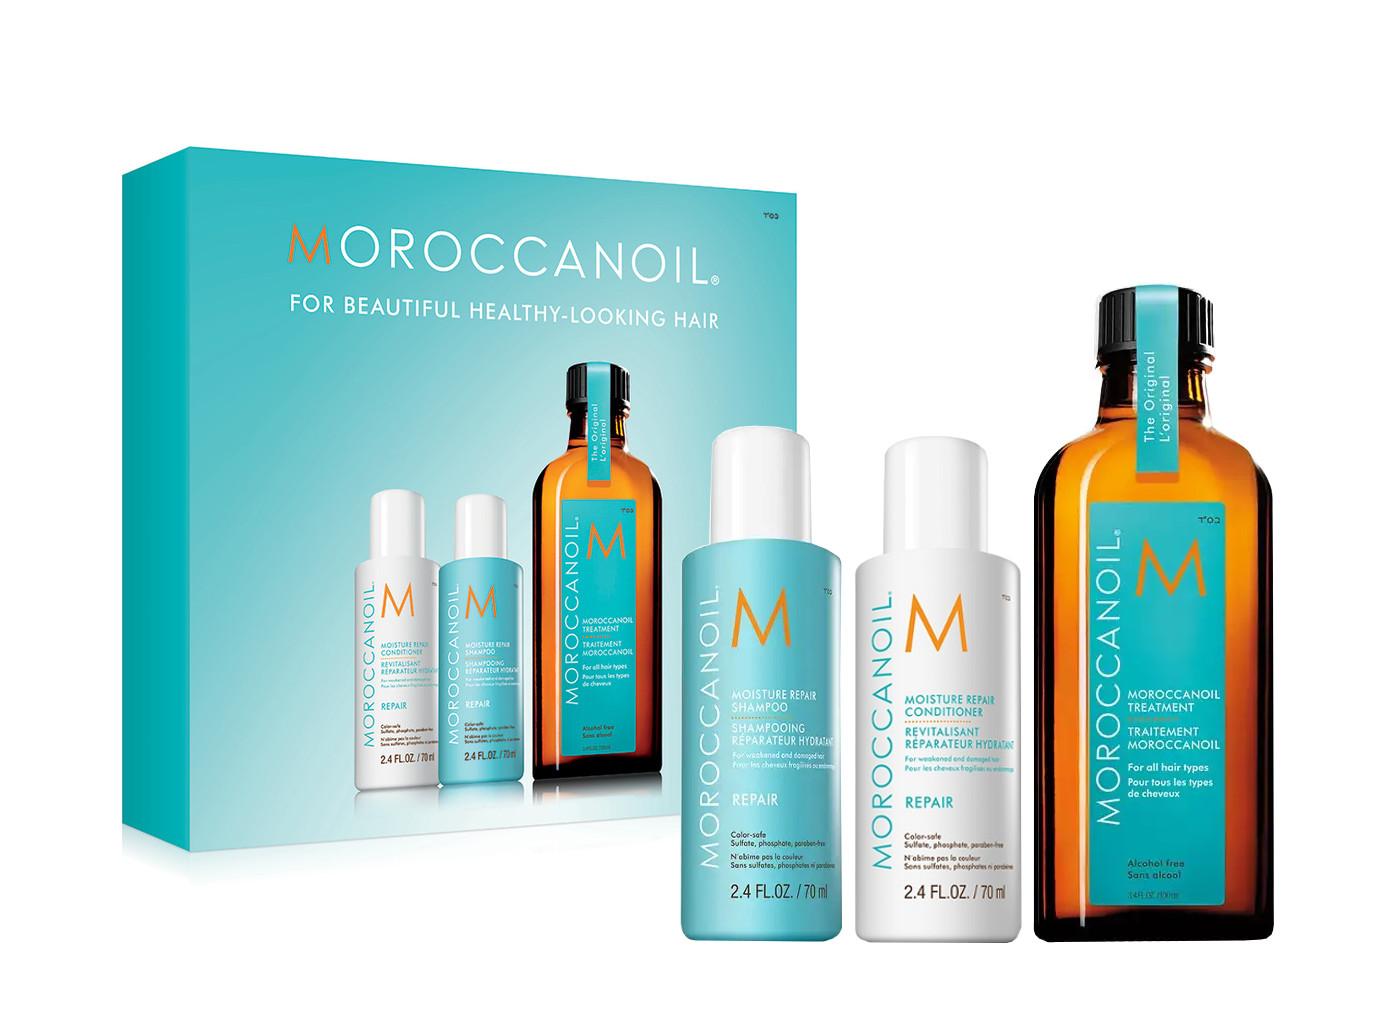 Olejová péče Moroccanoil Treatment - 100 ml + šampon a kondicionér Repair 70 ml zdarma (KIT492CZ) + DÁREK ZDARMA